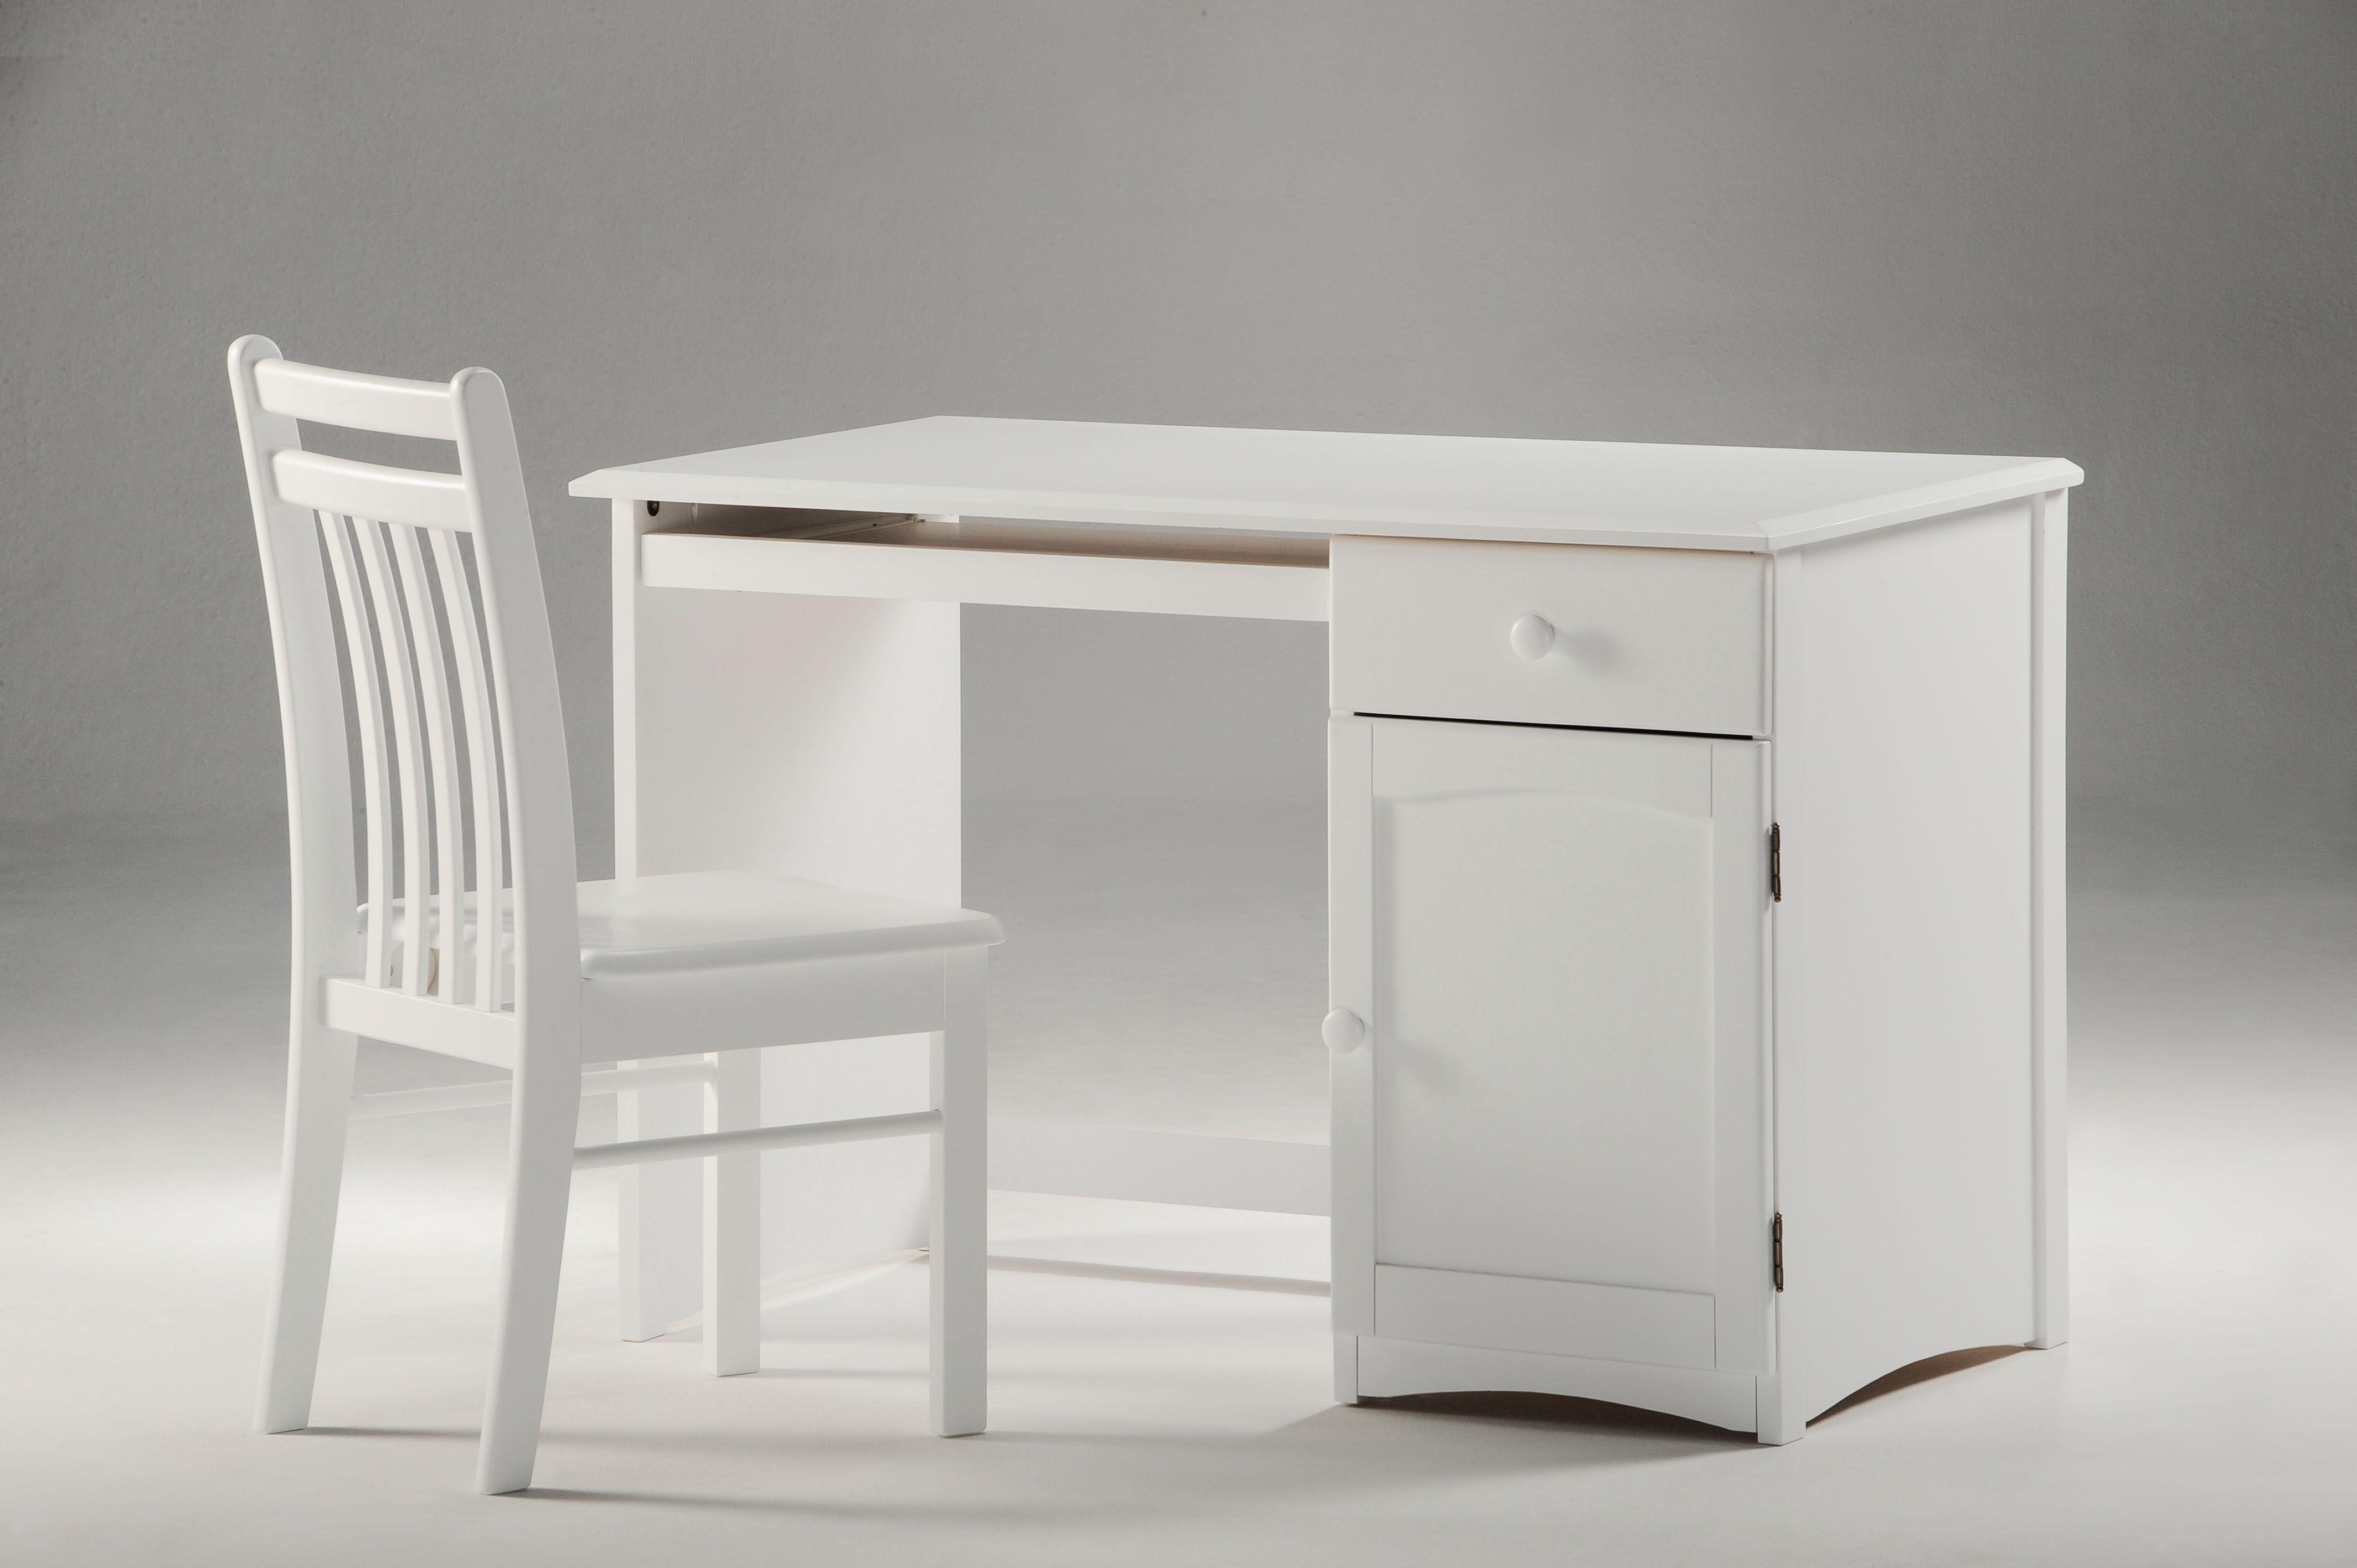 Clove Wood Student Desk W Chair Student Desks Desk White Desks